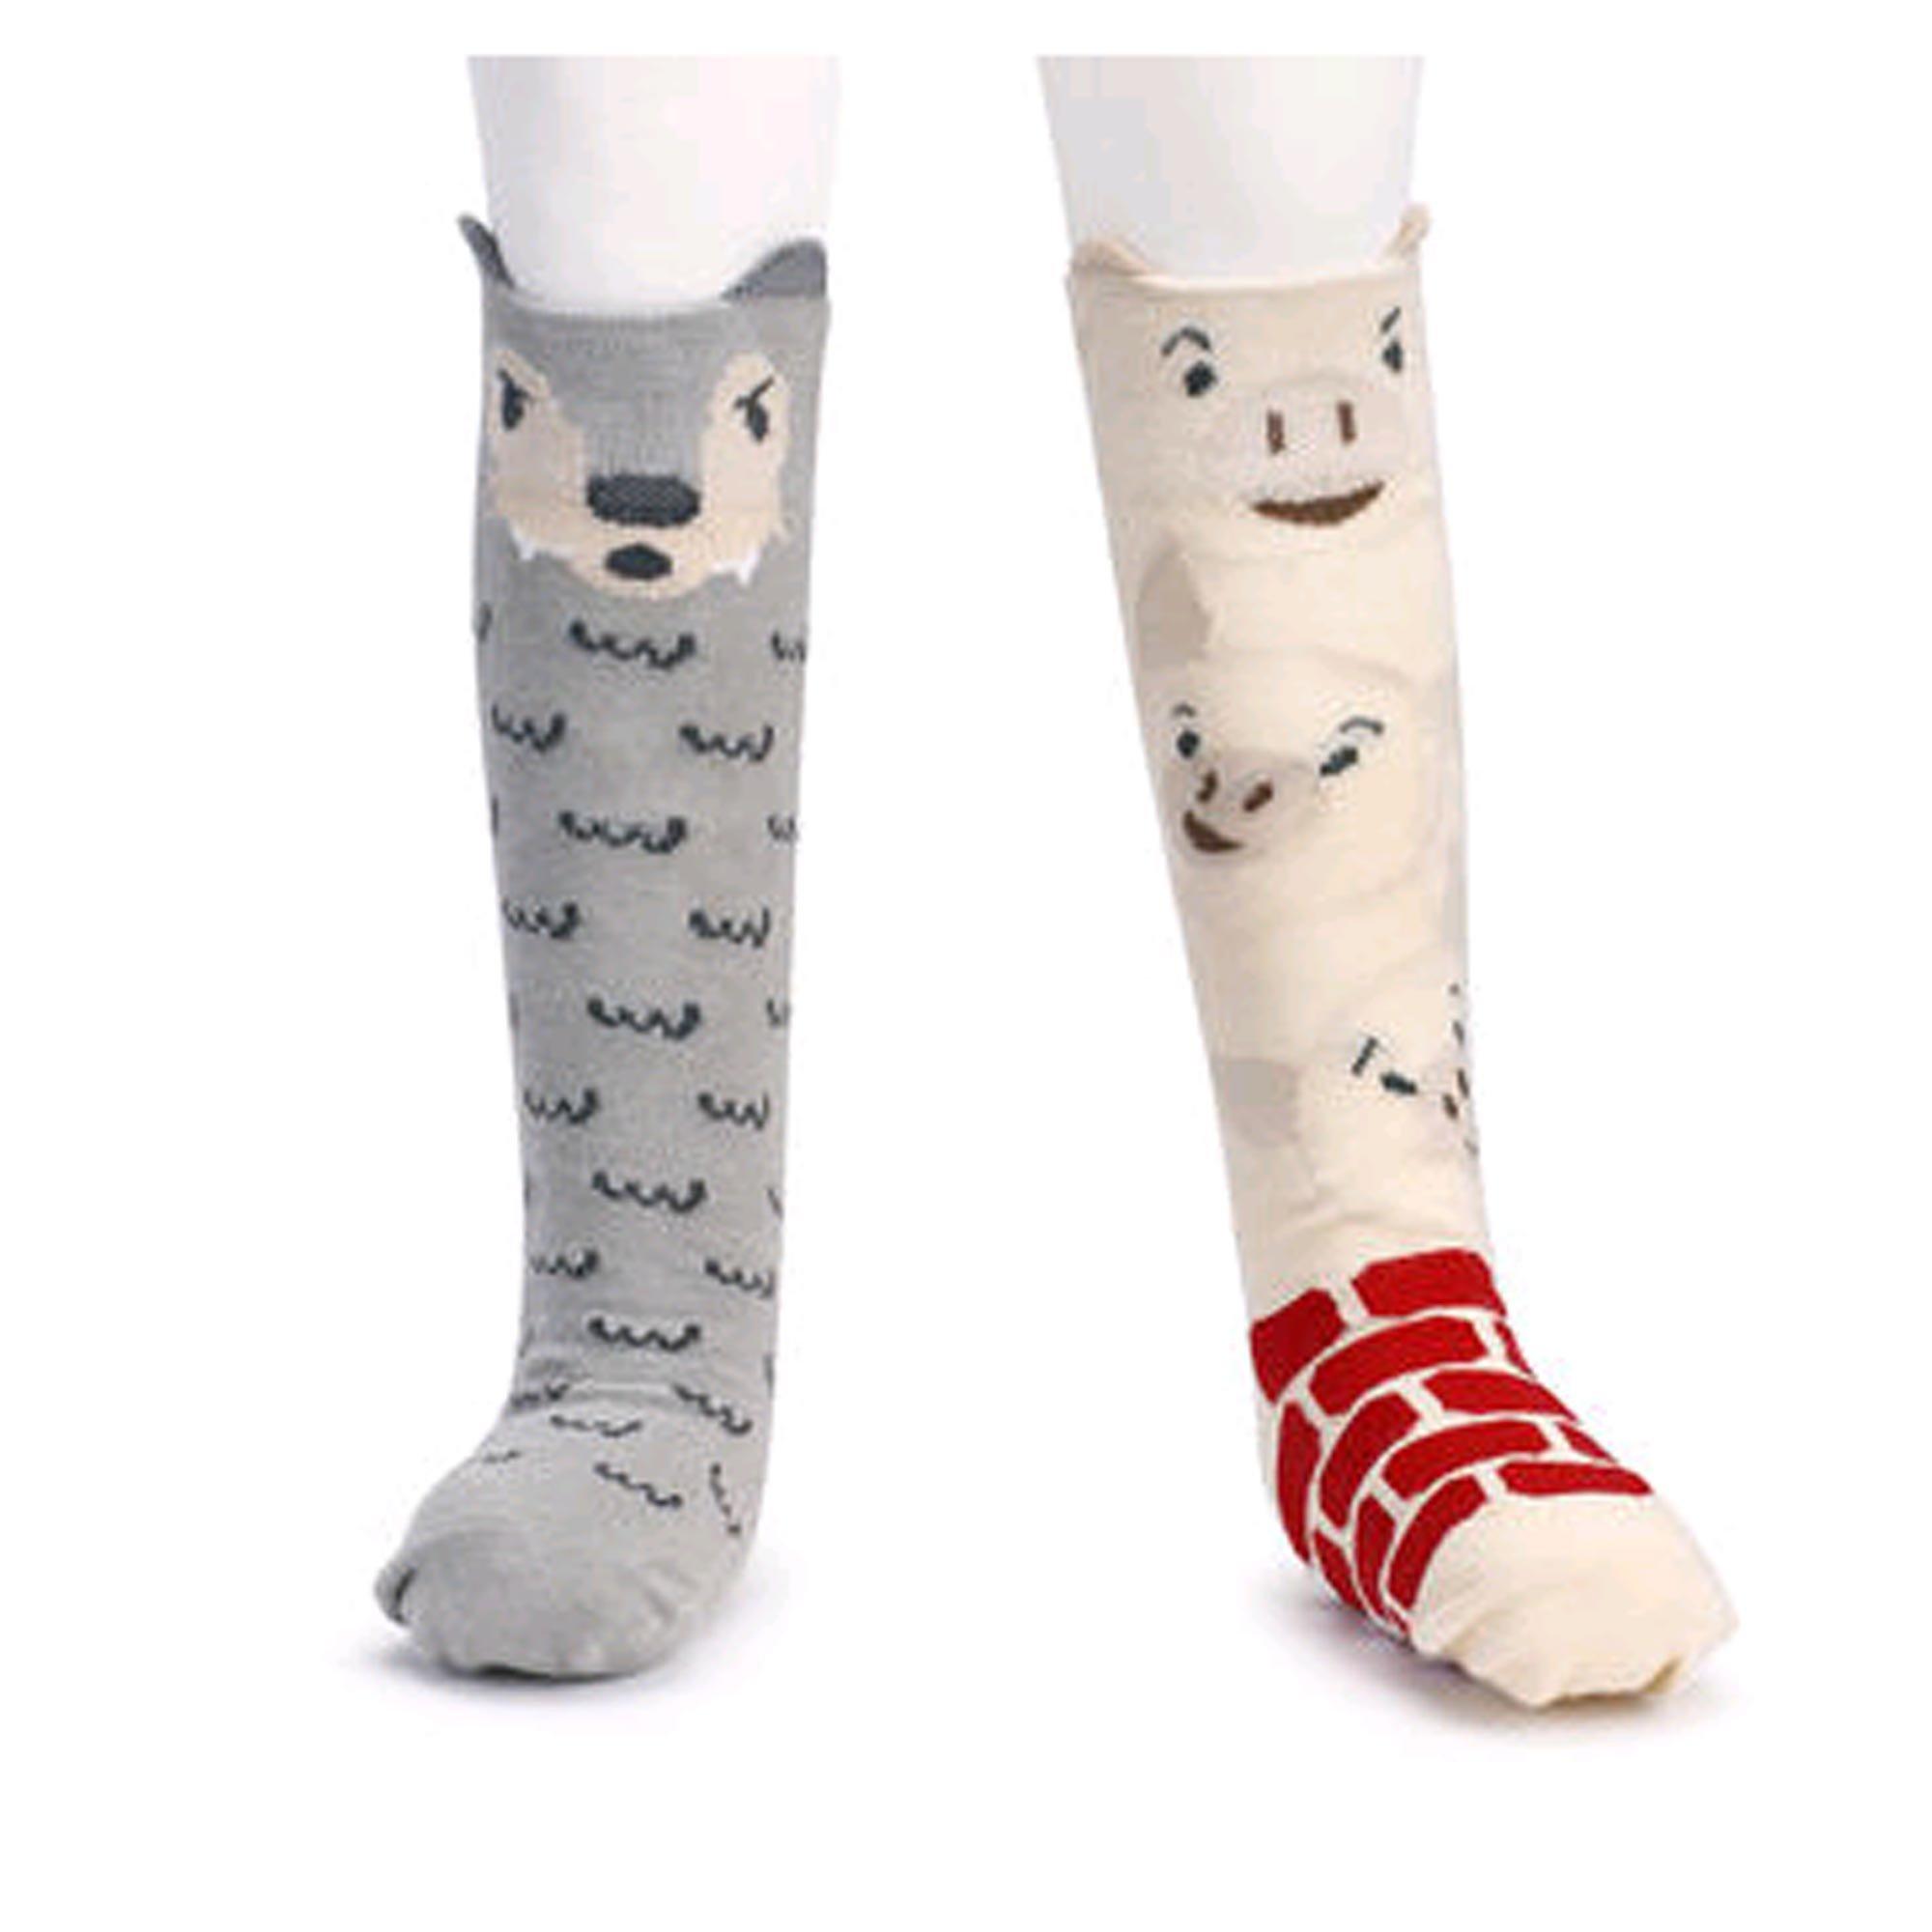 Amazon DEMDACO Knee Story Time Socks Goldilocks Three Bears